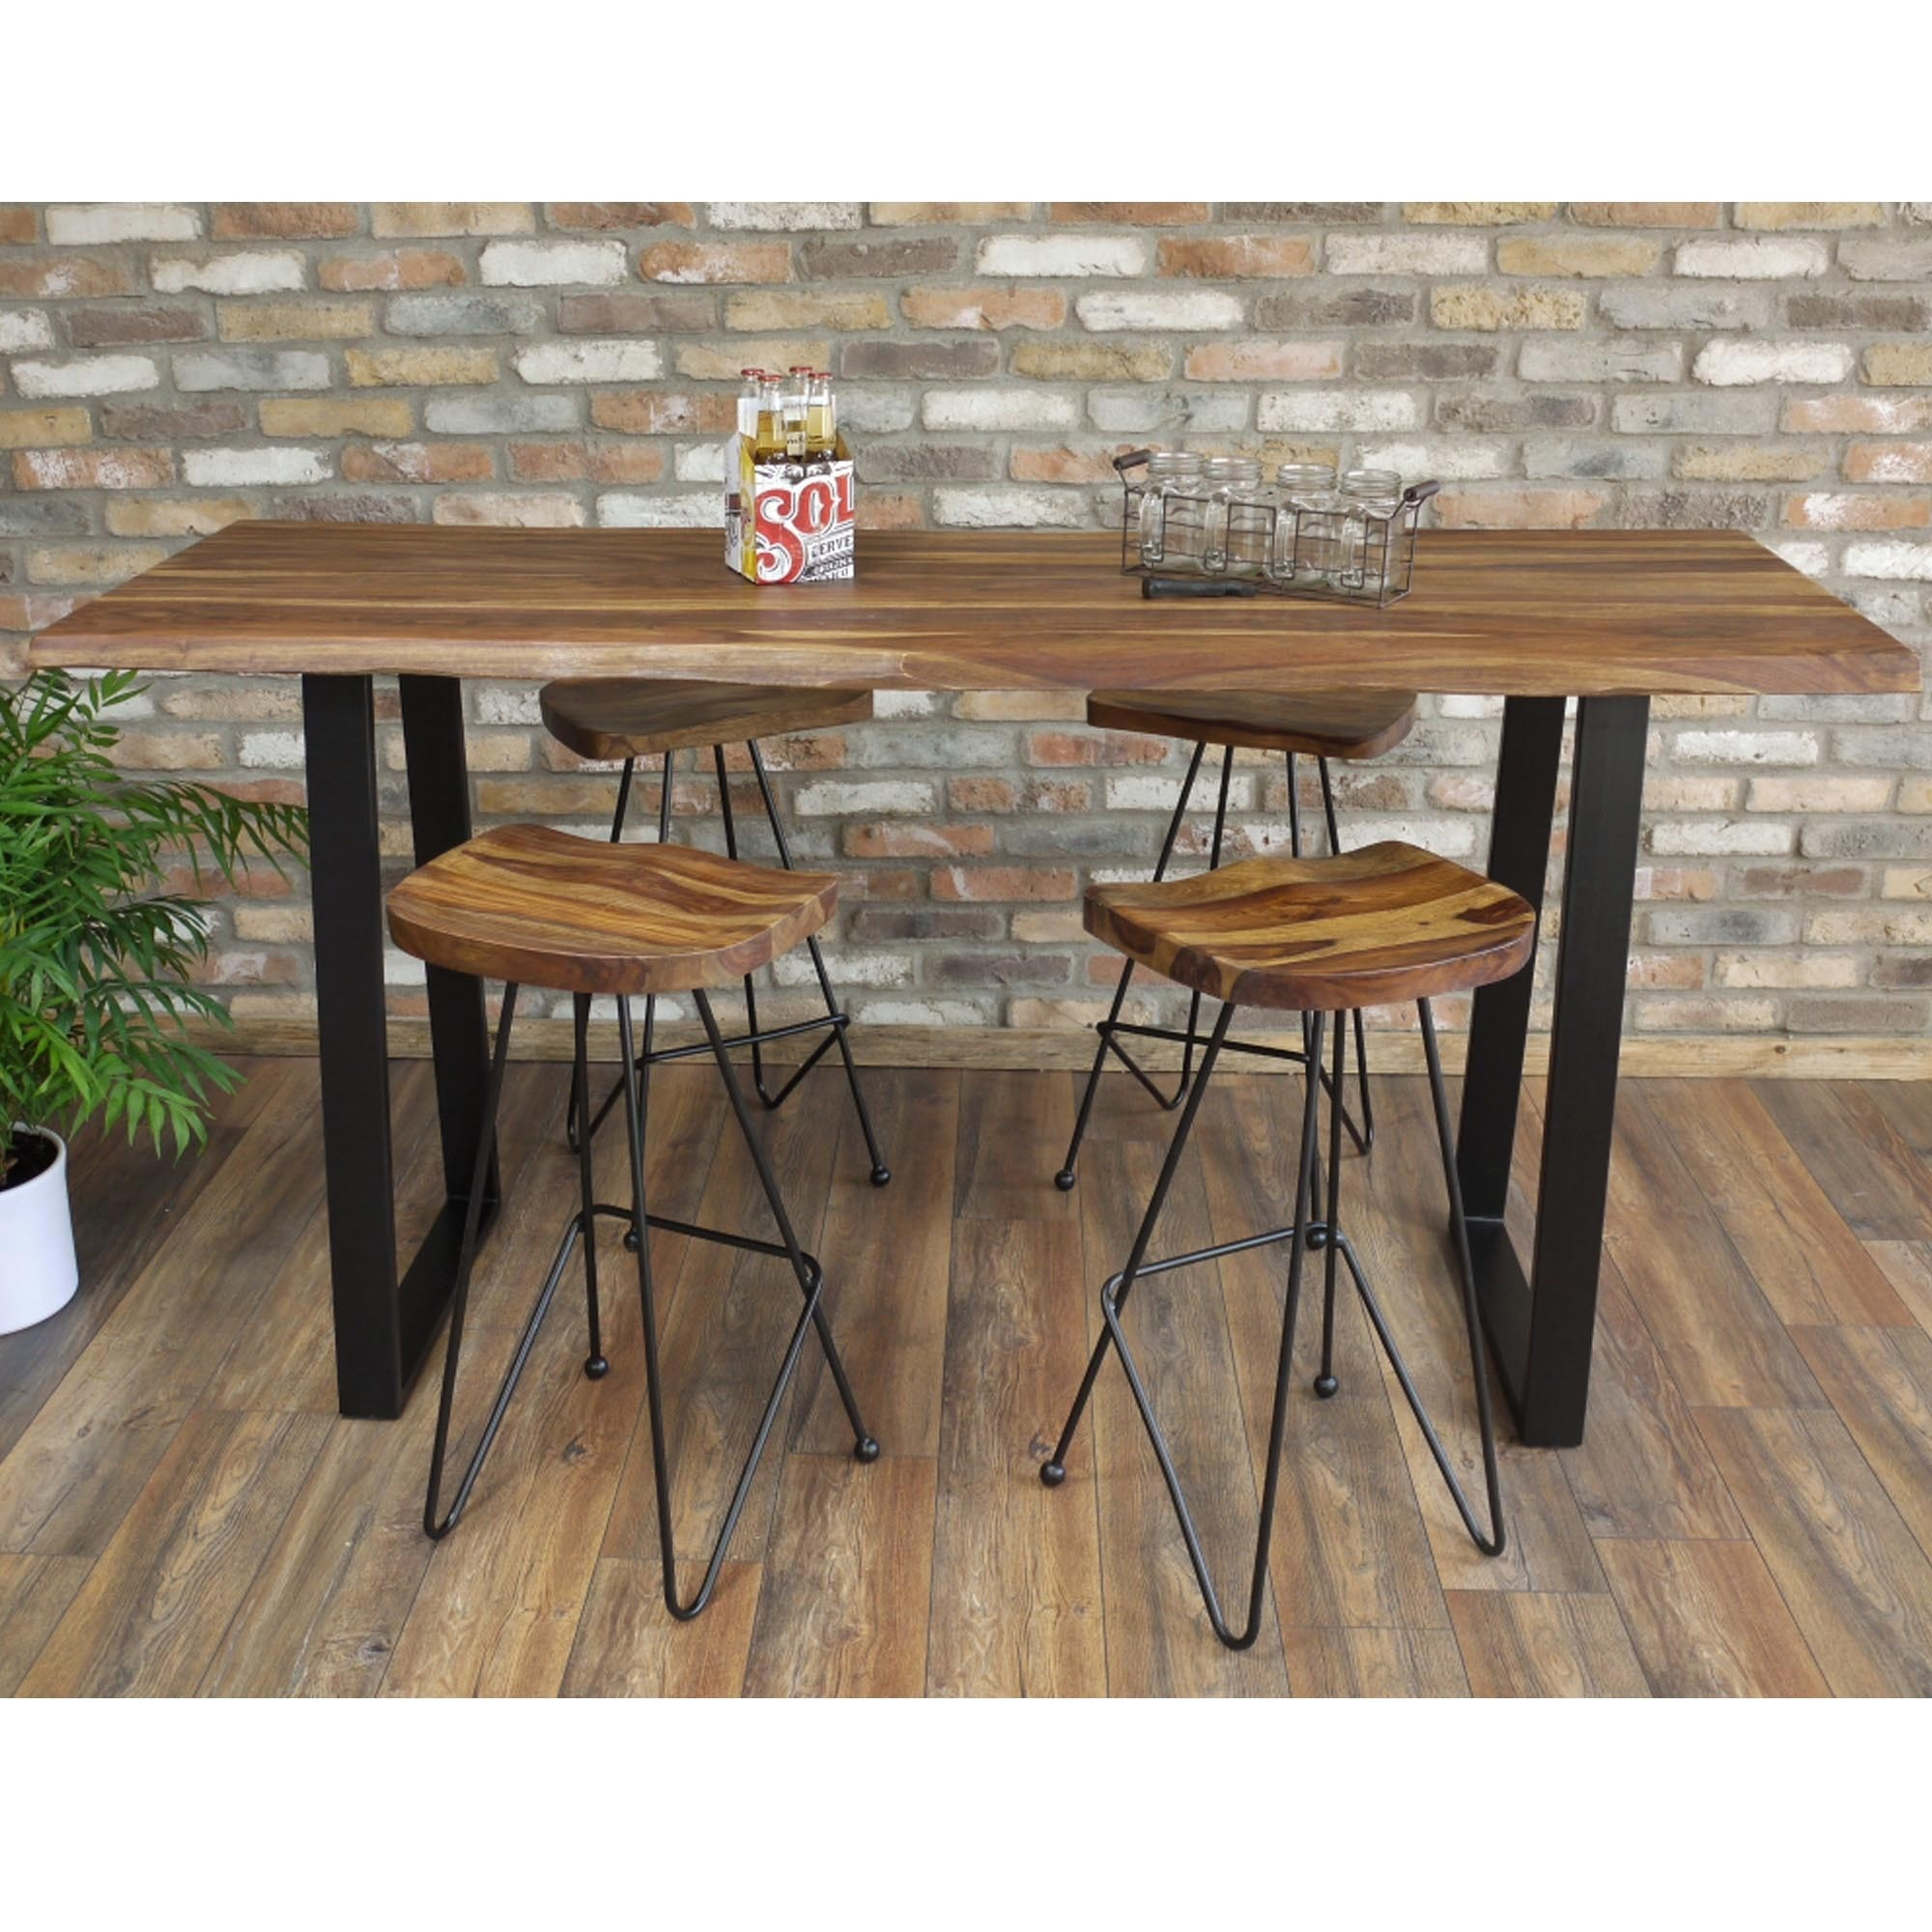 Iron Legs Living Edge Breakfast Bar Table